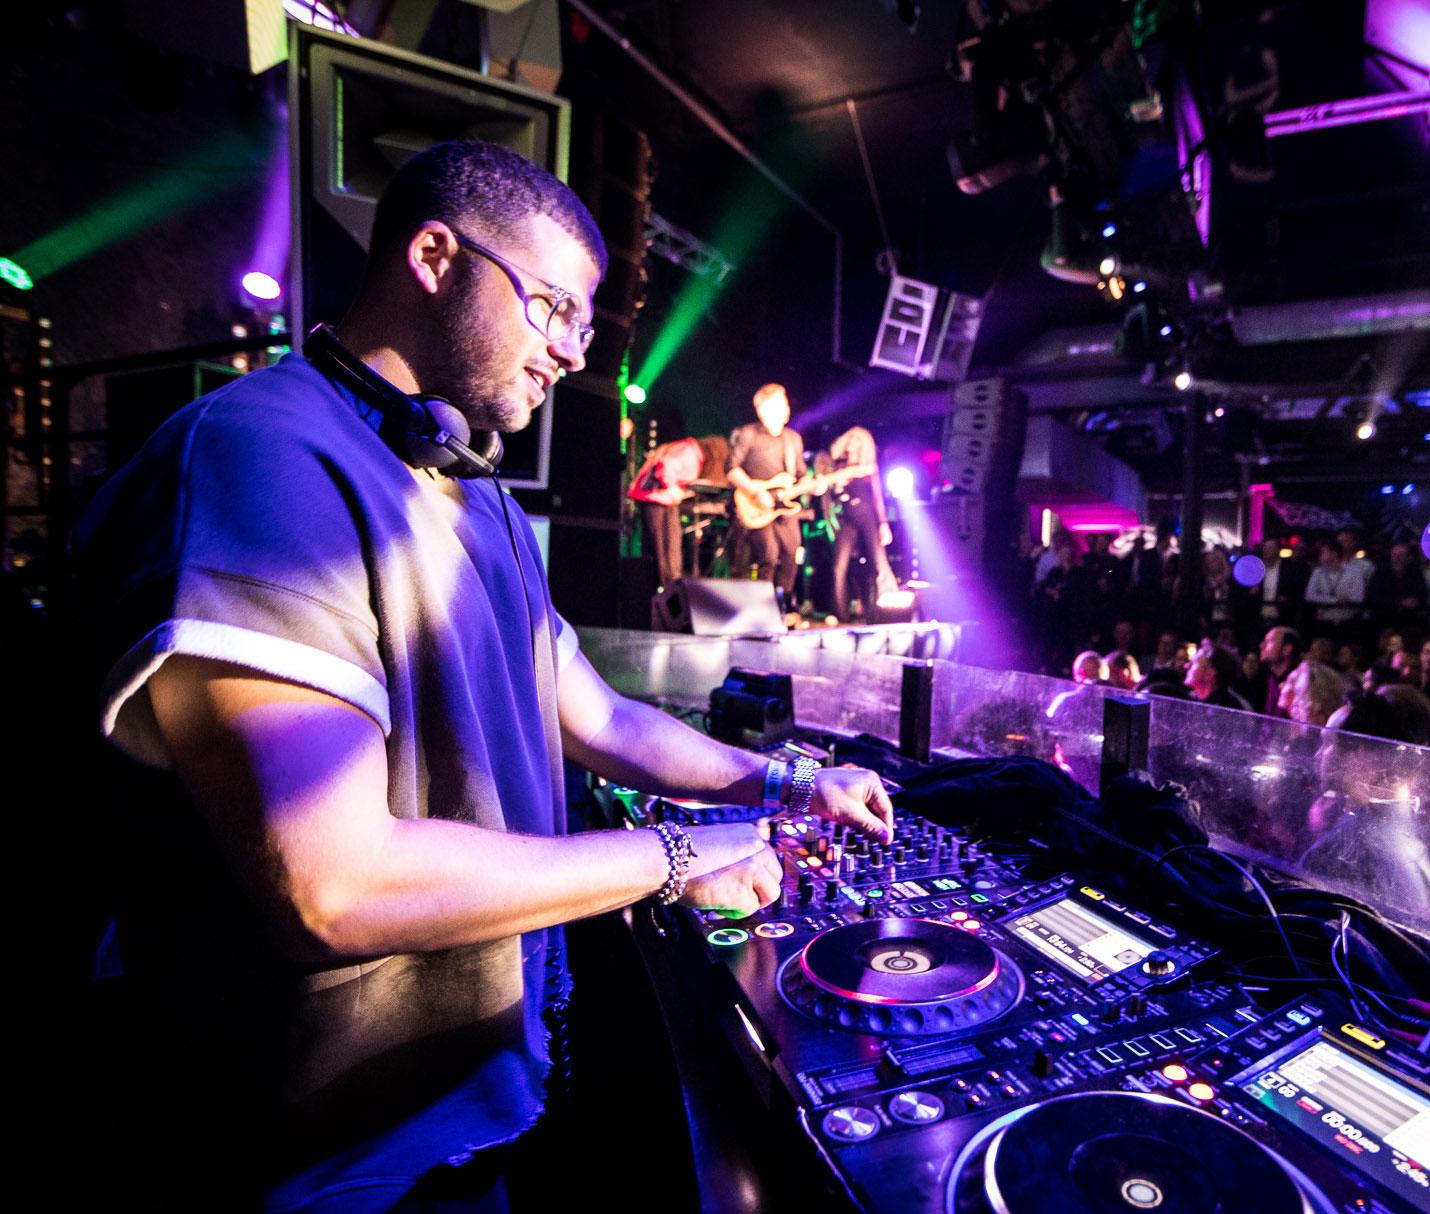 FRESH_MUSIC_LIVE_DJ_NSURE_09